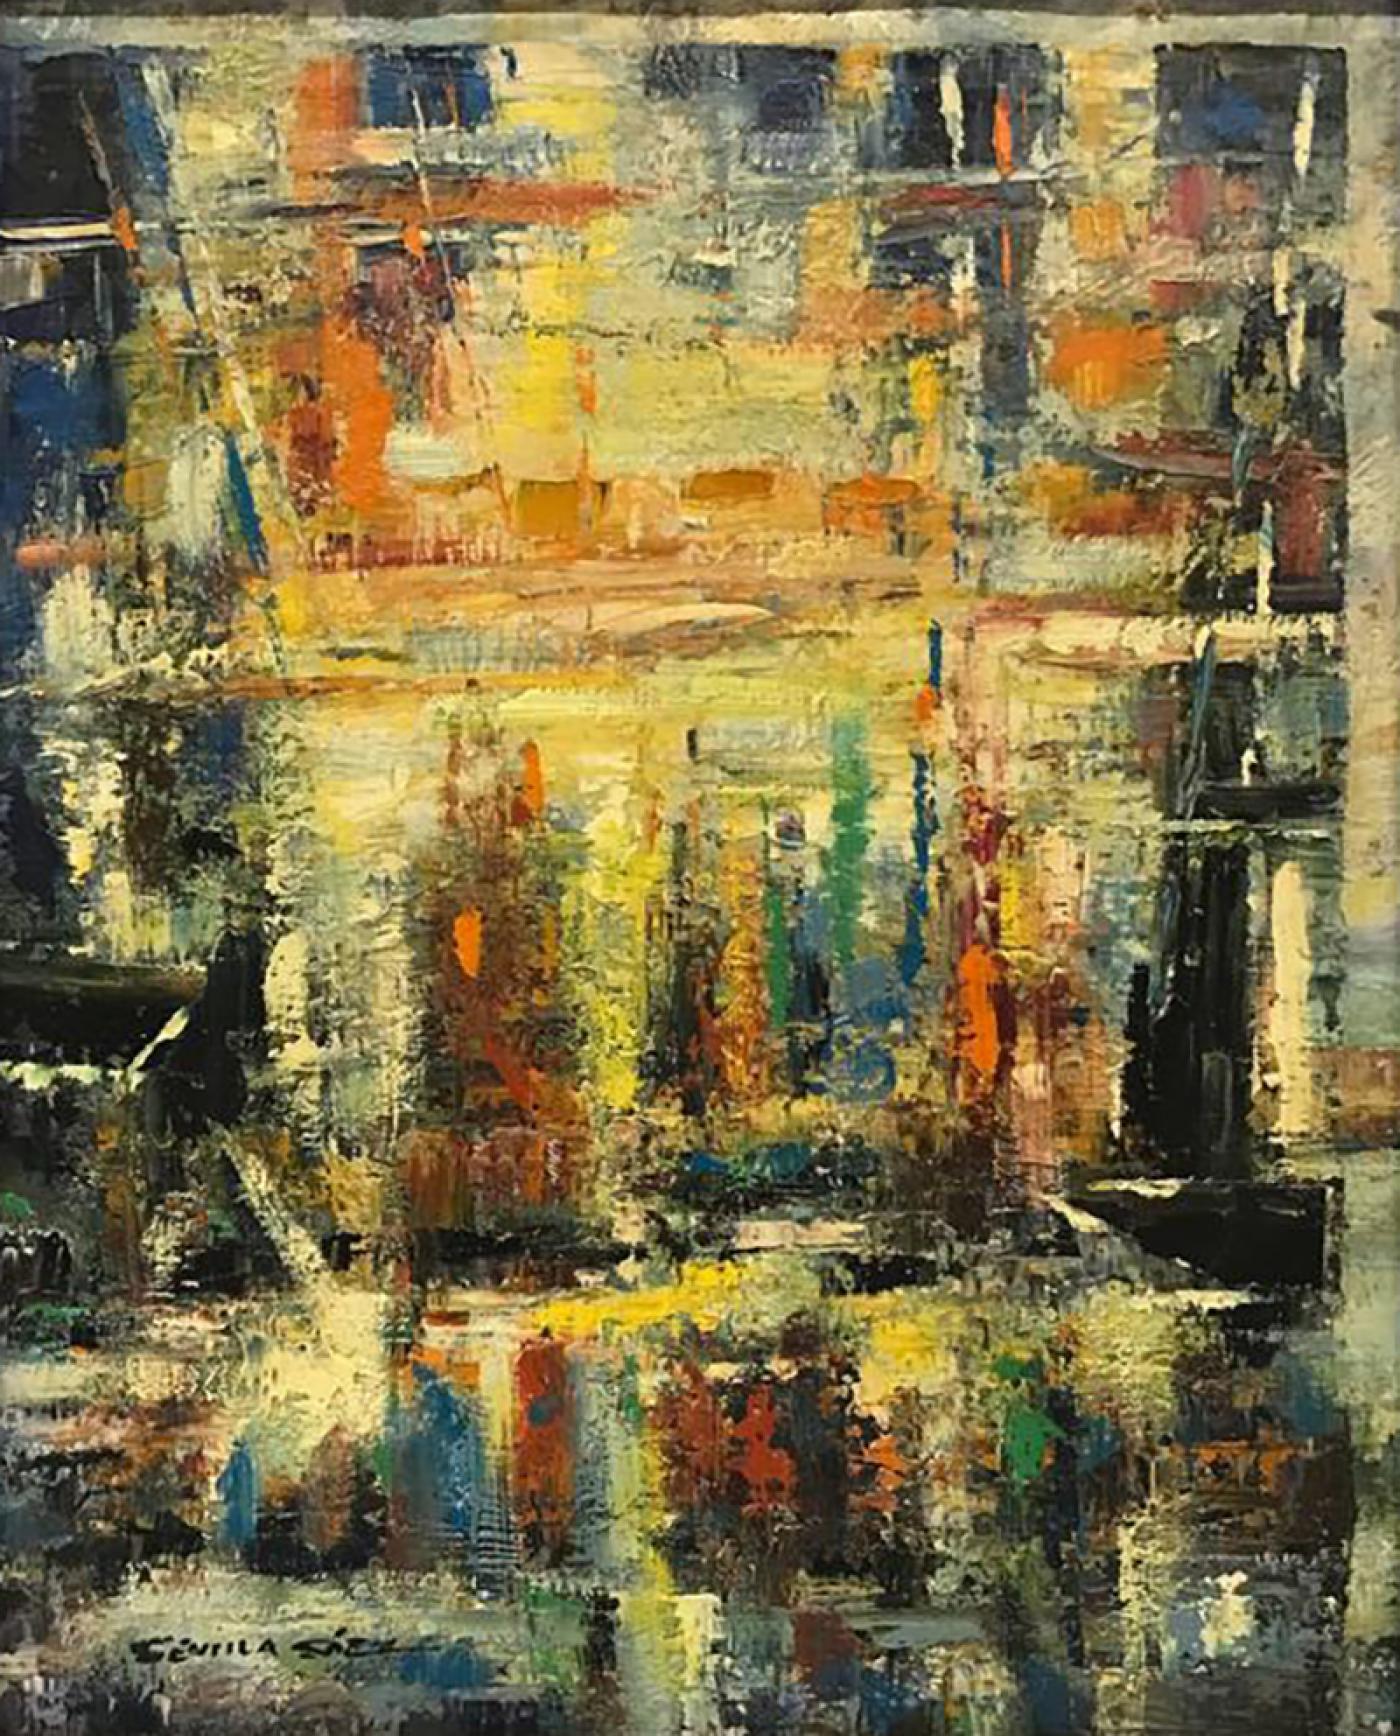 Juan Sevilla Saez - Rare Colorful Textured Abstract by Juan Sevilla Saez